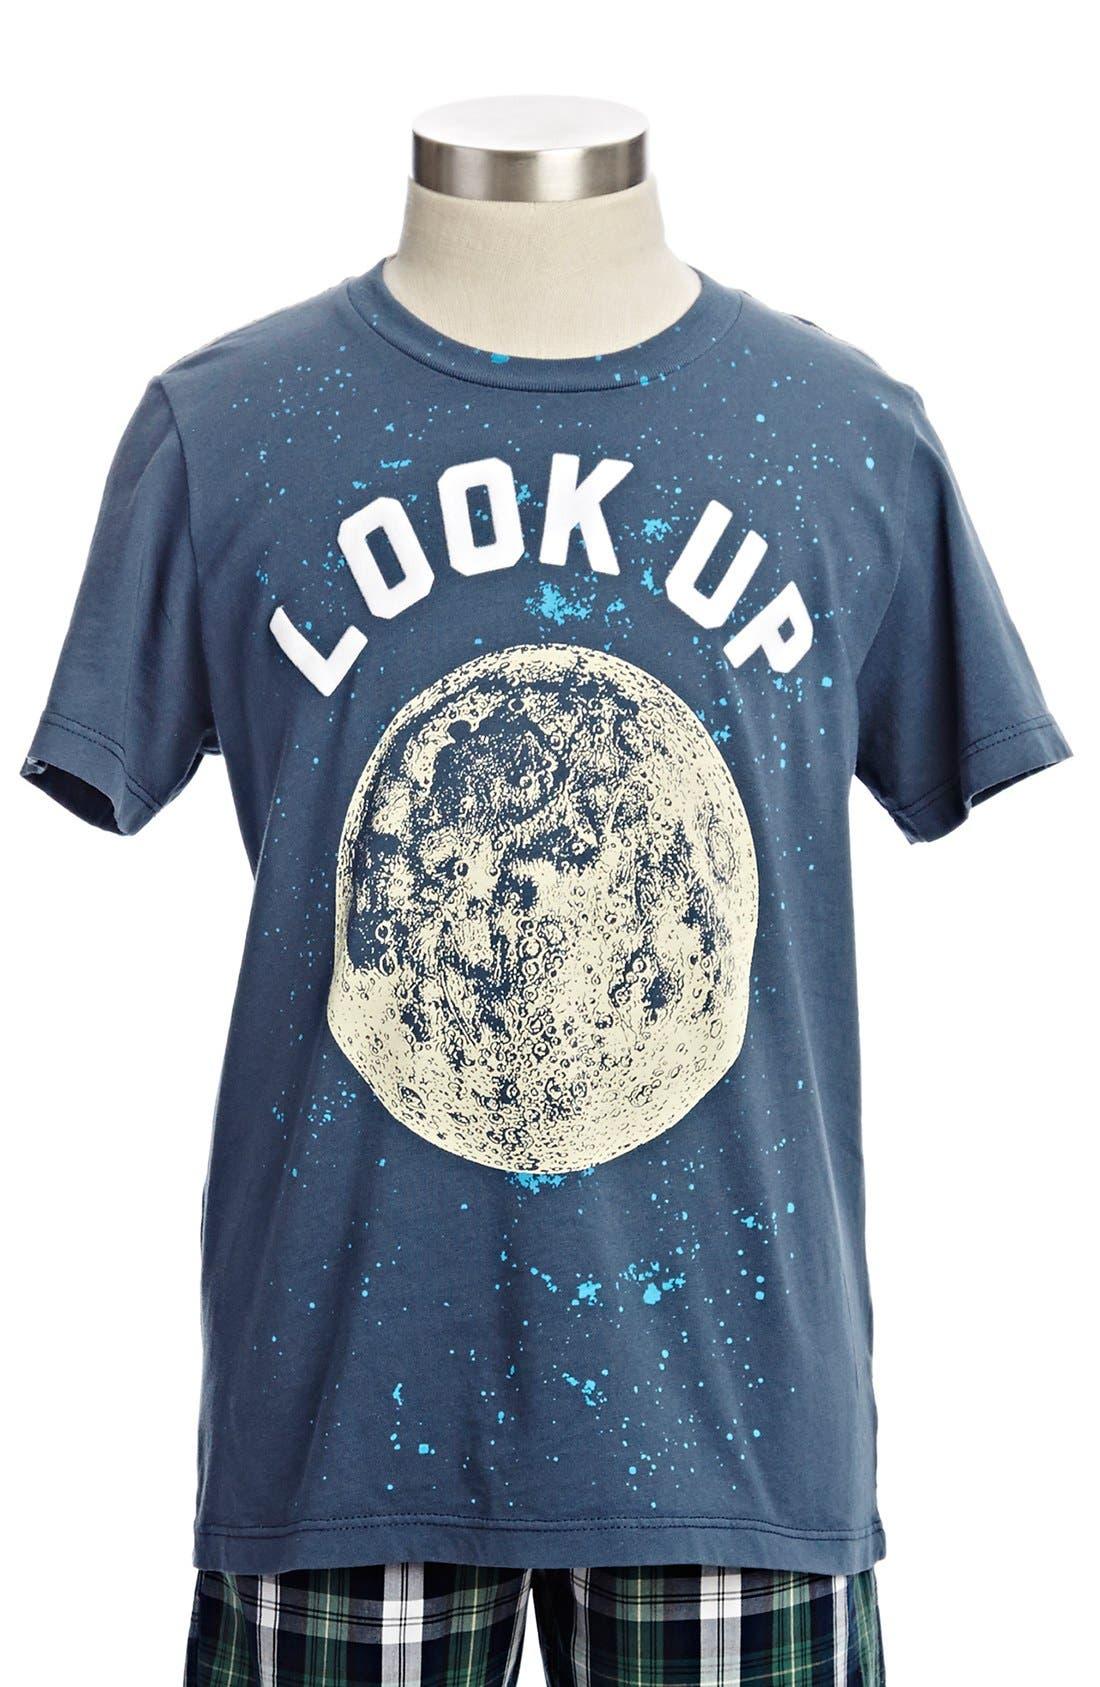 Alternate Image 1 Selected - Peek 'Look Up' T-Shirt (Toddler Boys, Little Boys & Big Boys)